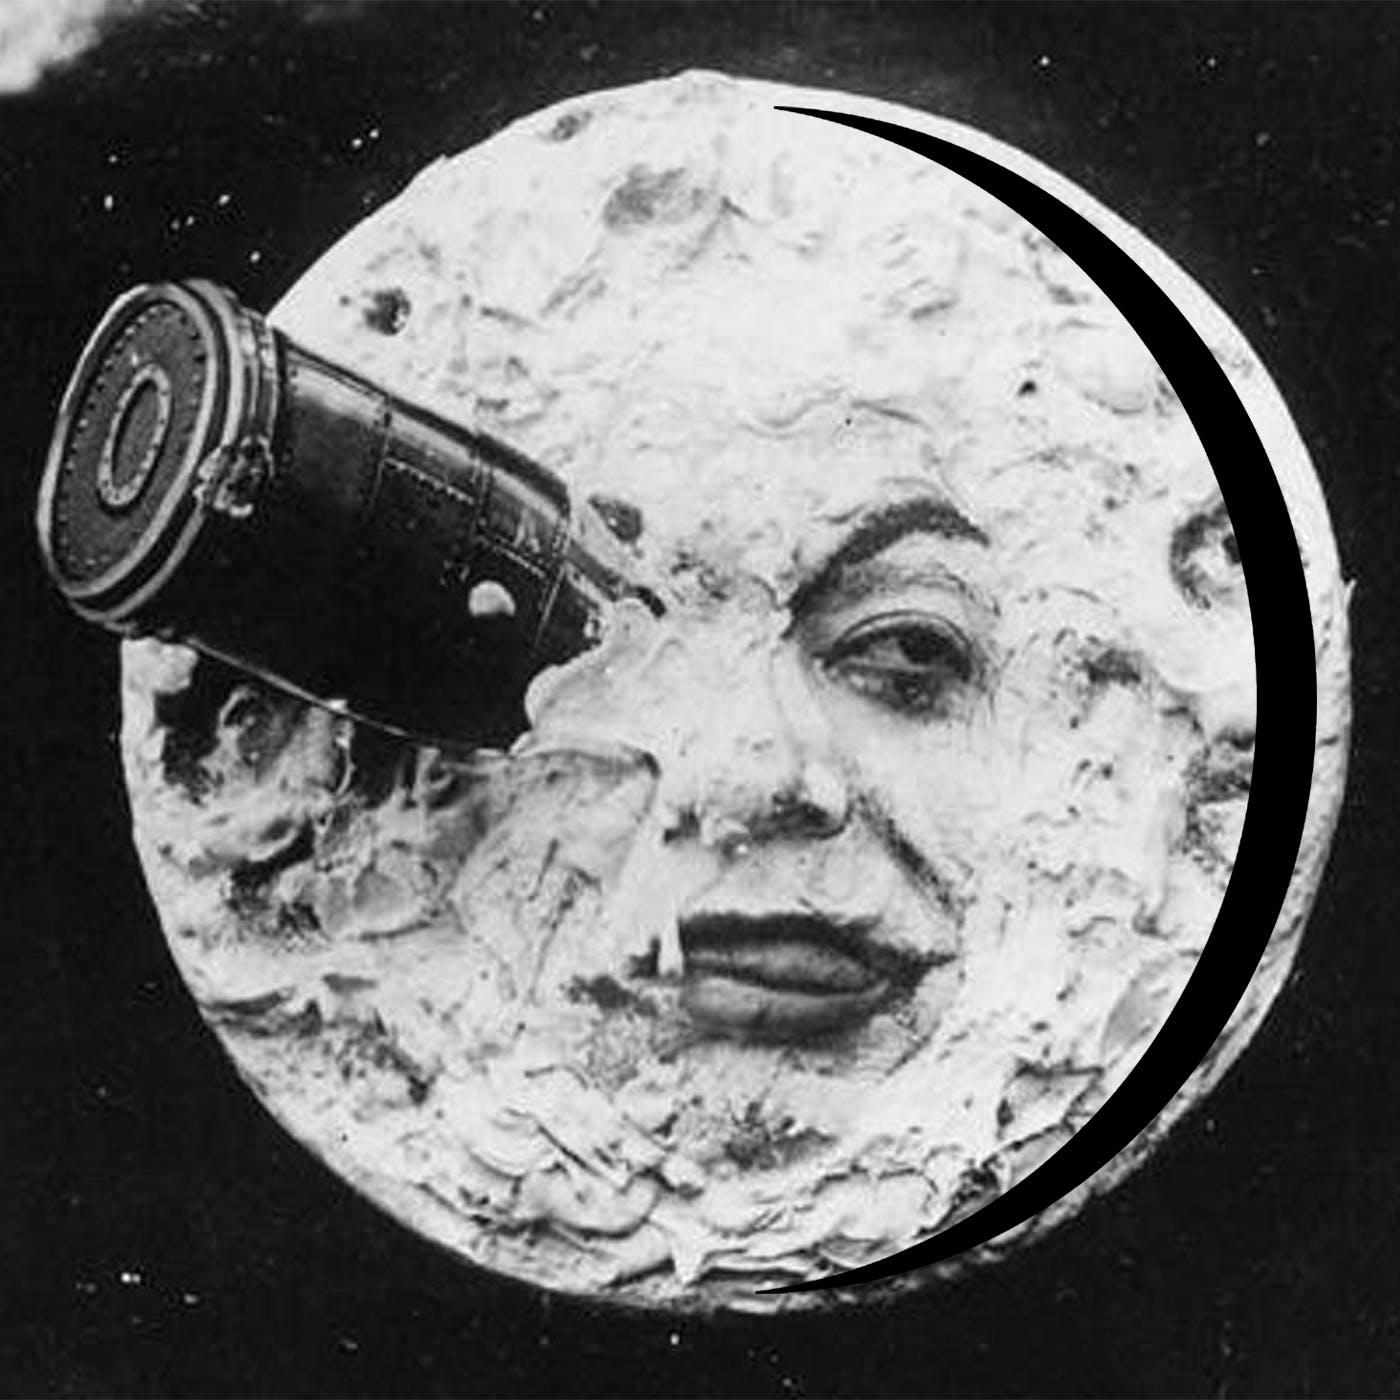 Quale sarà la nostra Luna? Una Generazione senza Progetto